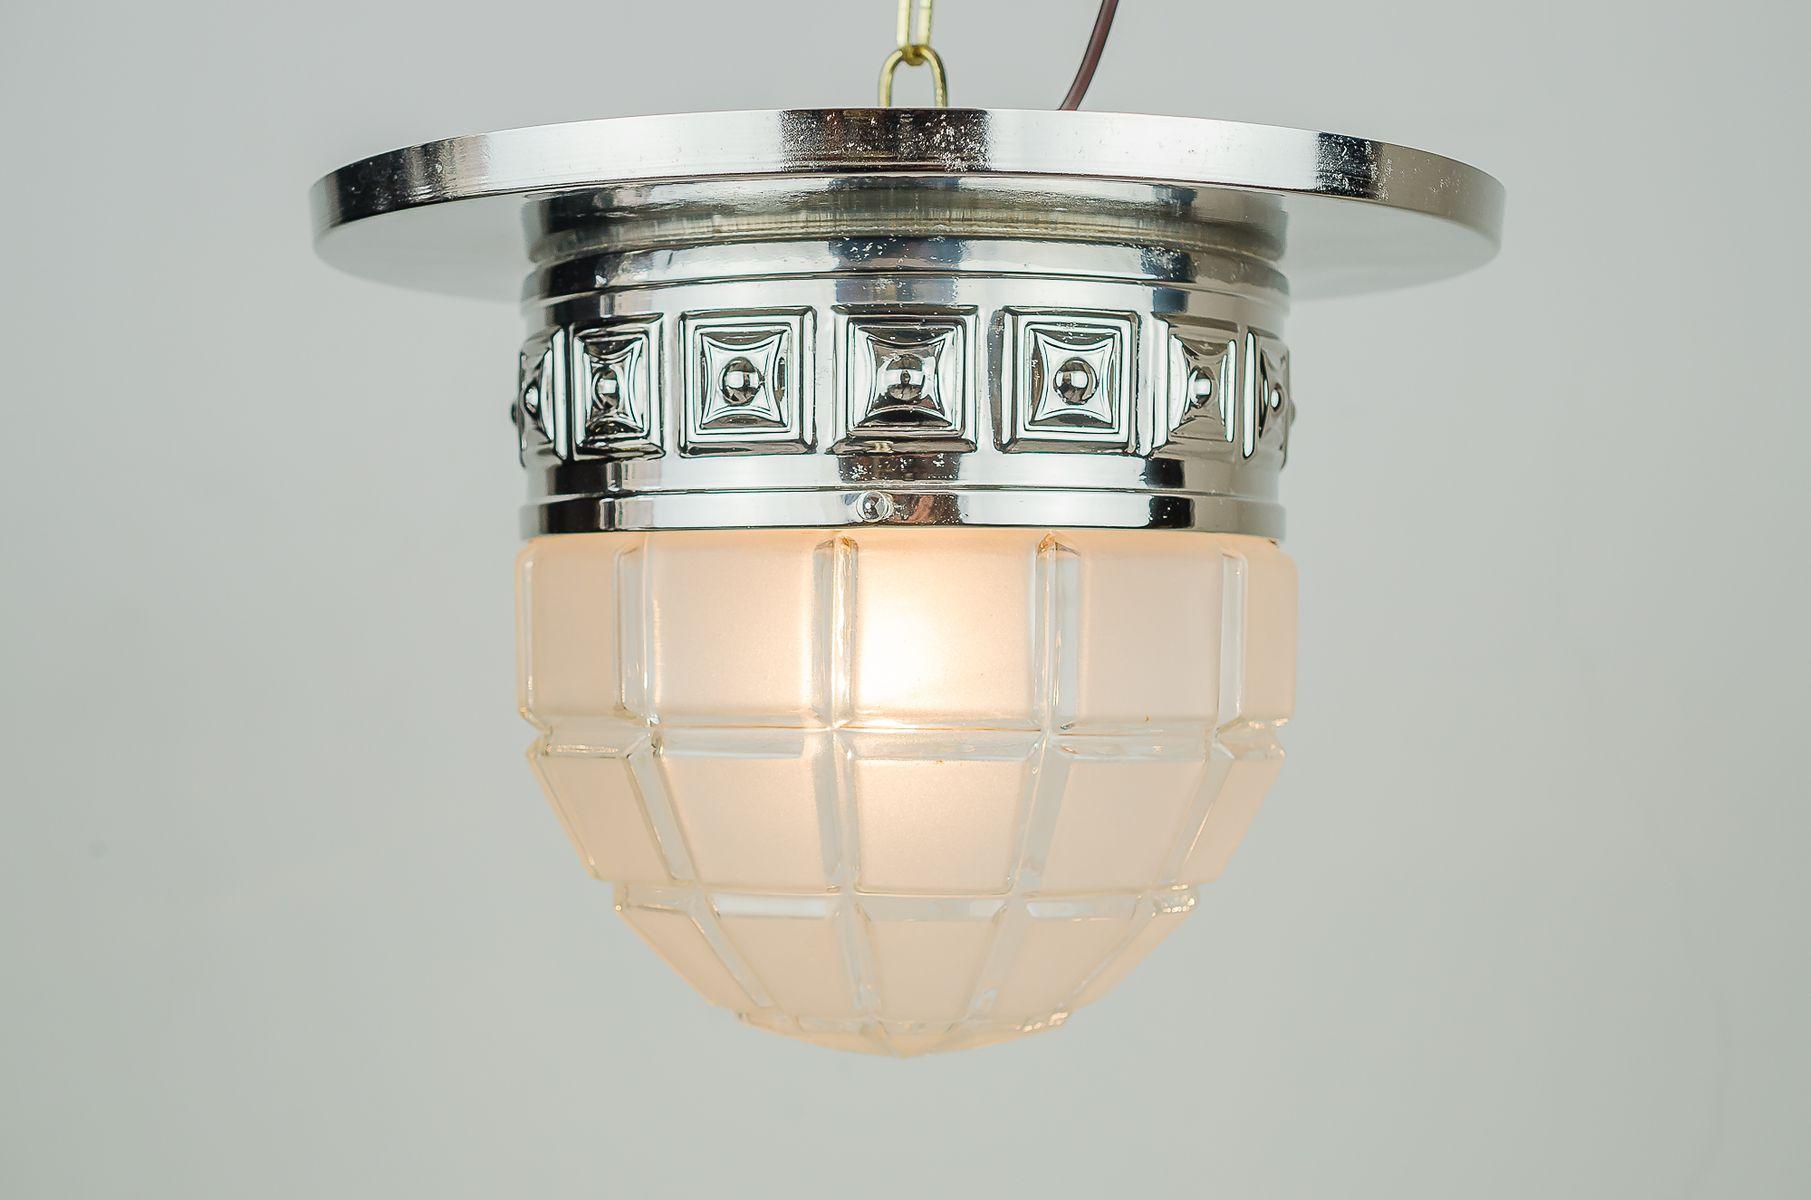 astoria asp large light style p ceiling deco pendant art tiffany inverted ceilings